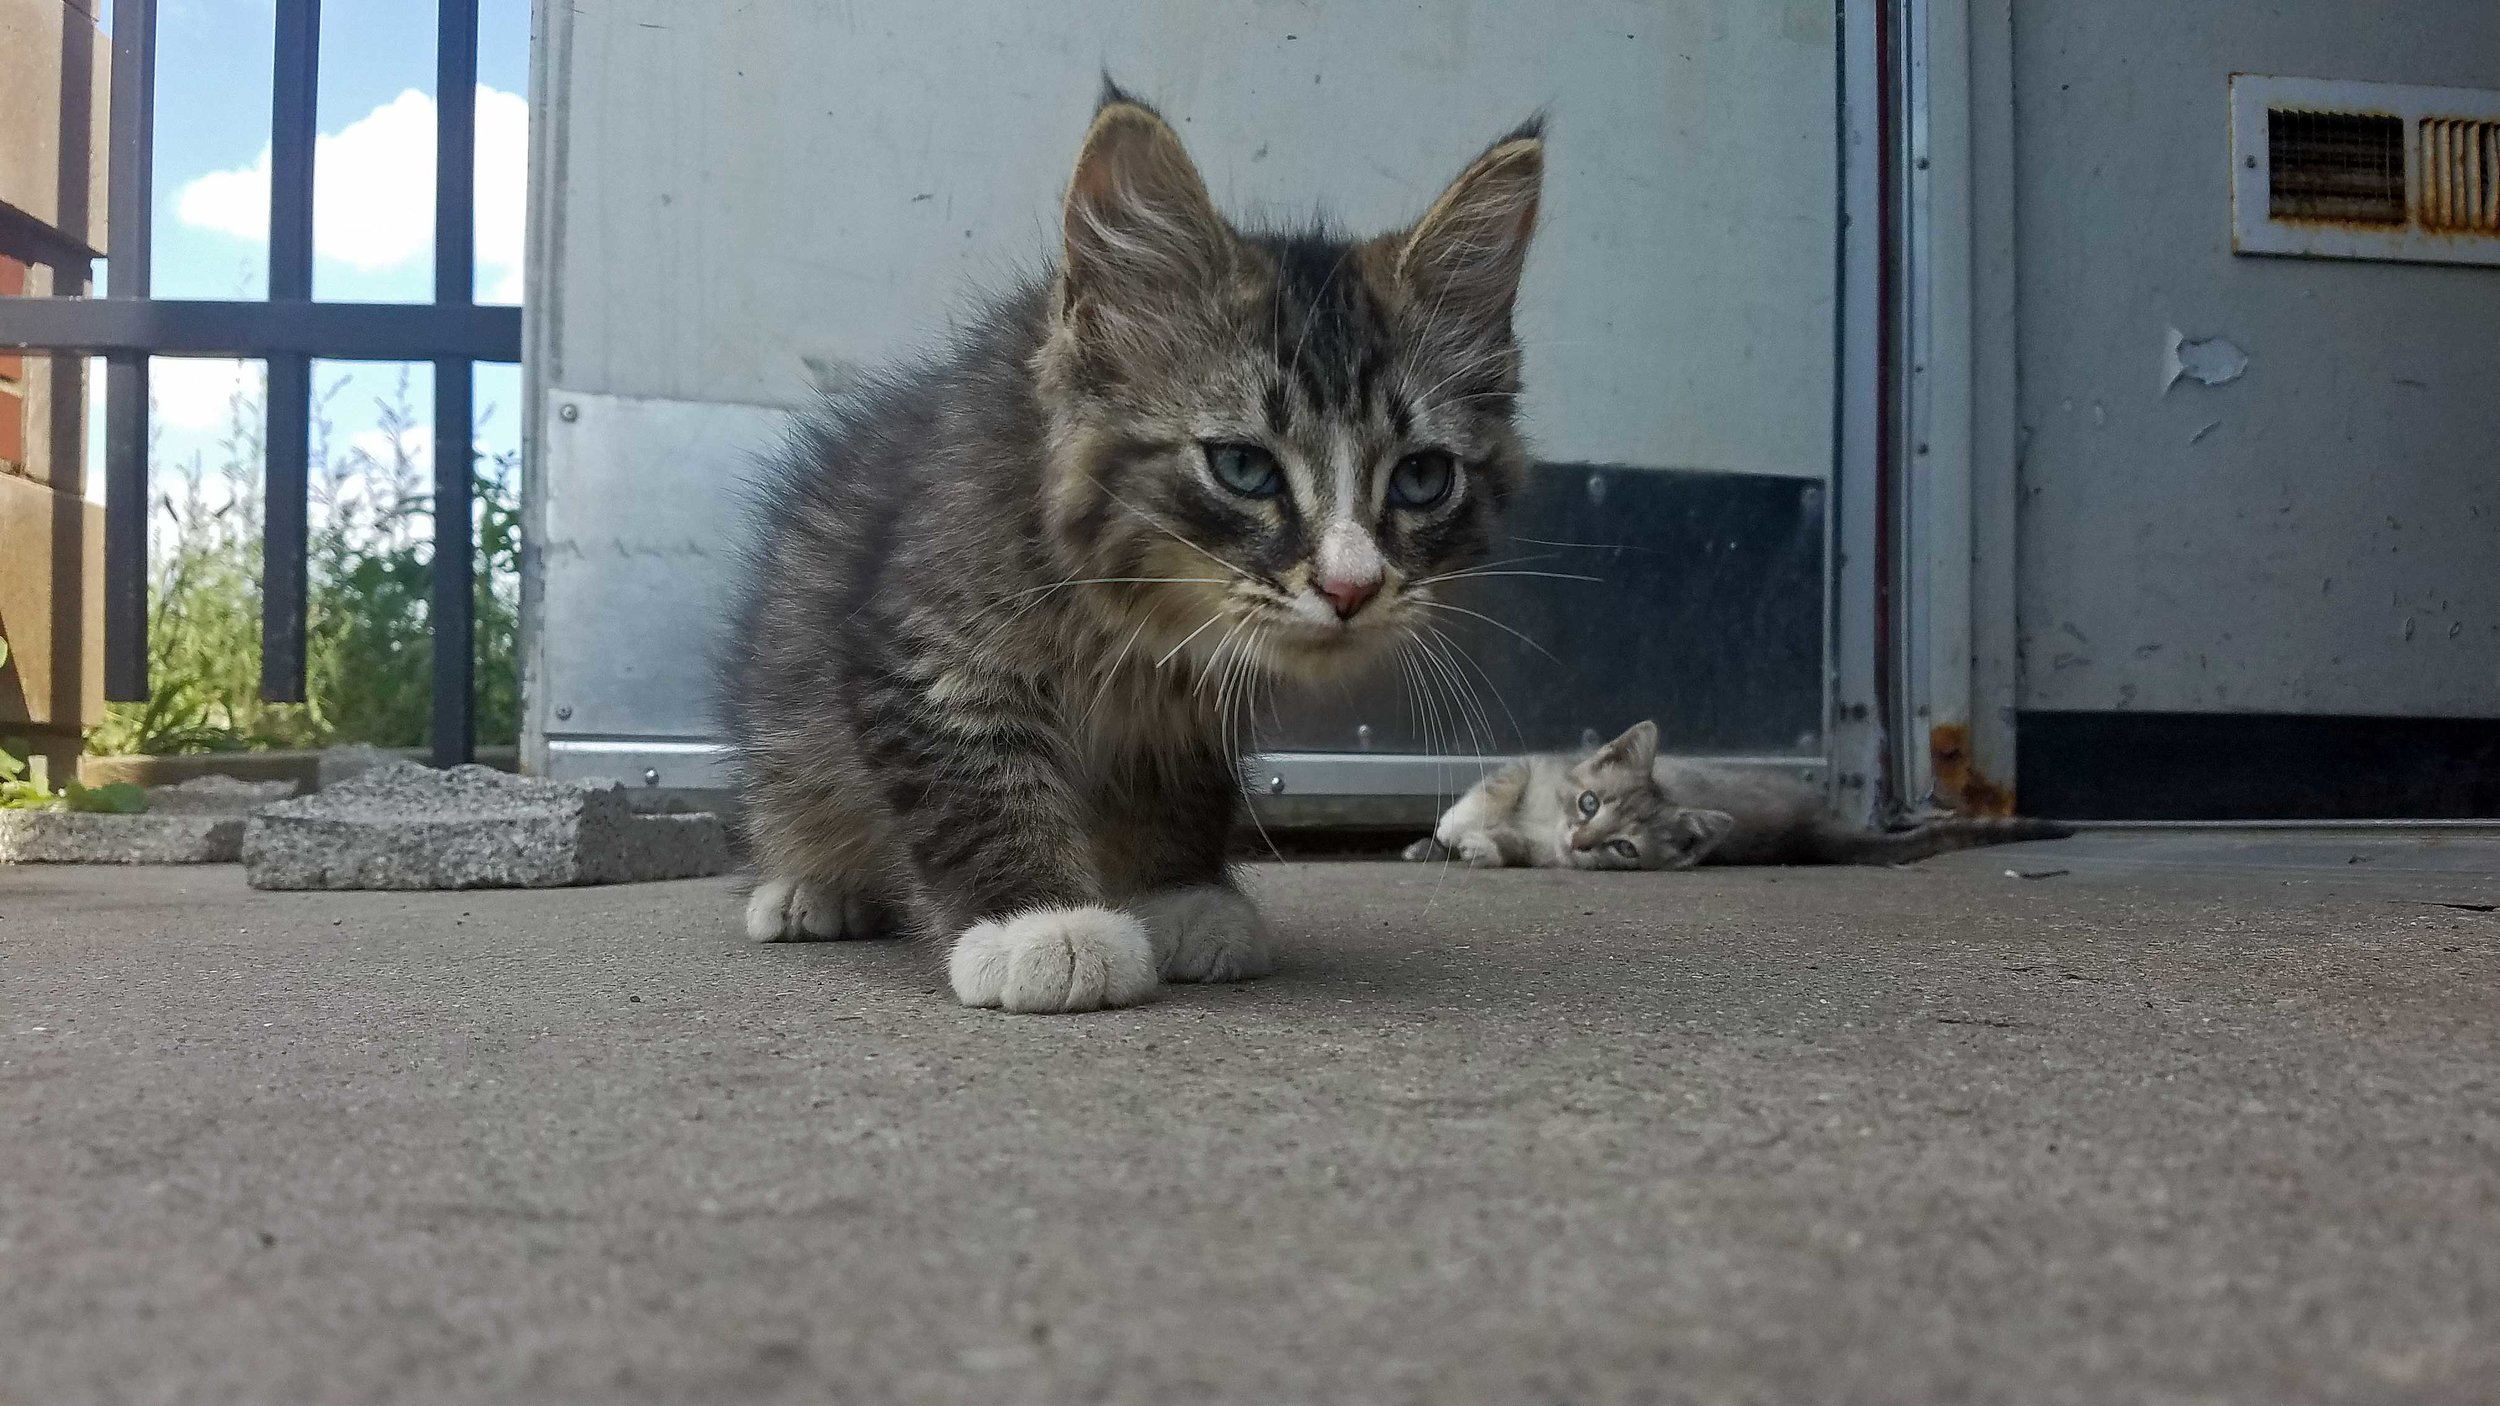 Cats-01-Web.jpg